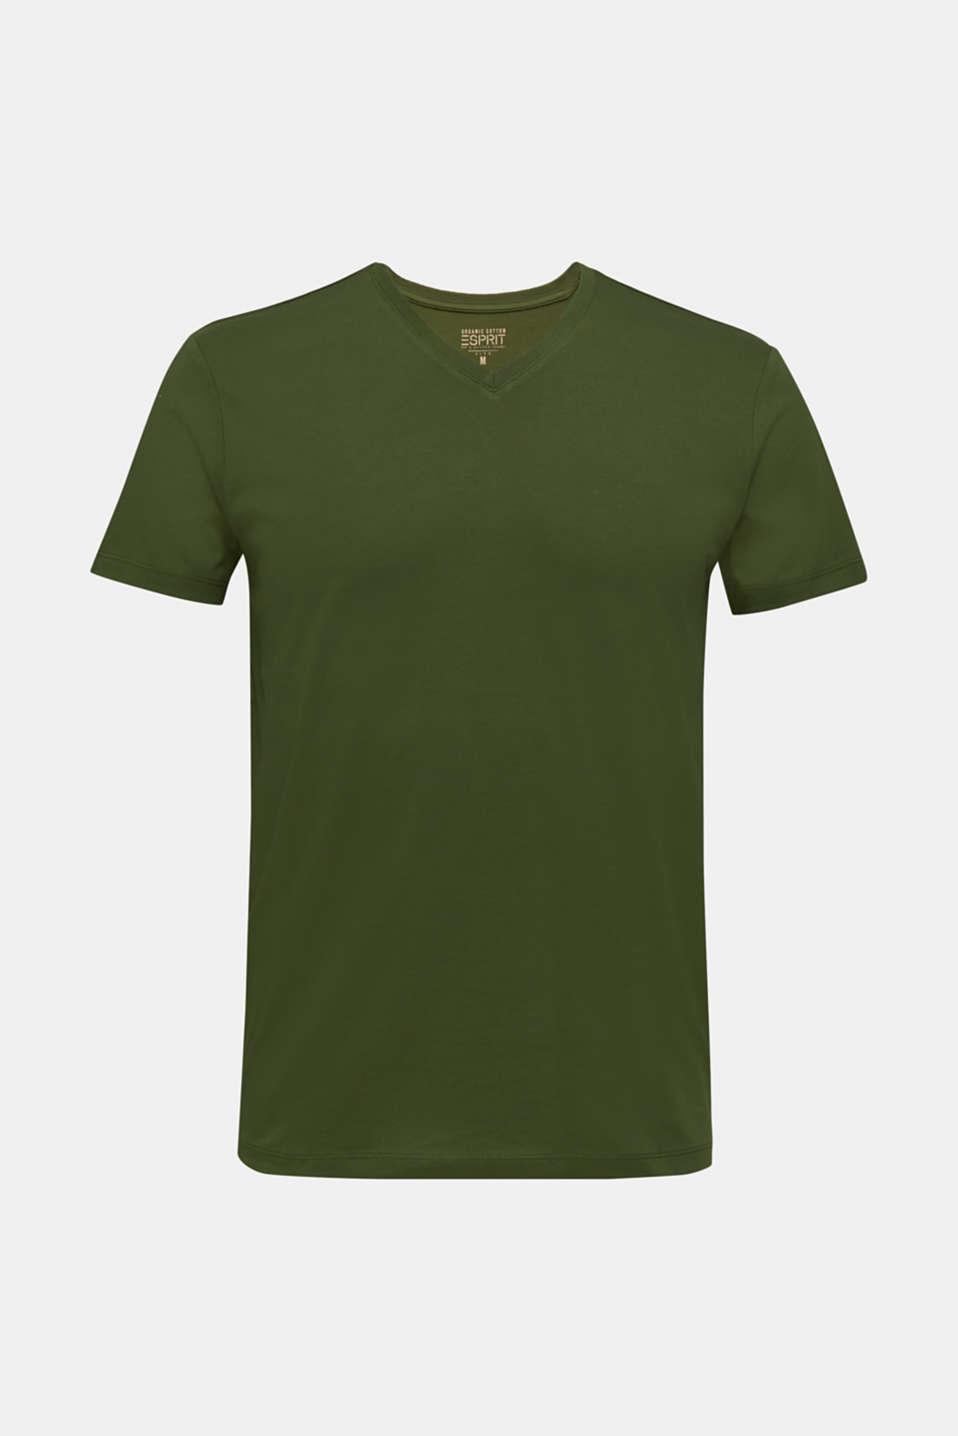 Jersey T-shirt in 100% cotton, KHAKI GREEN, detail image number 7